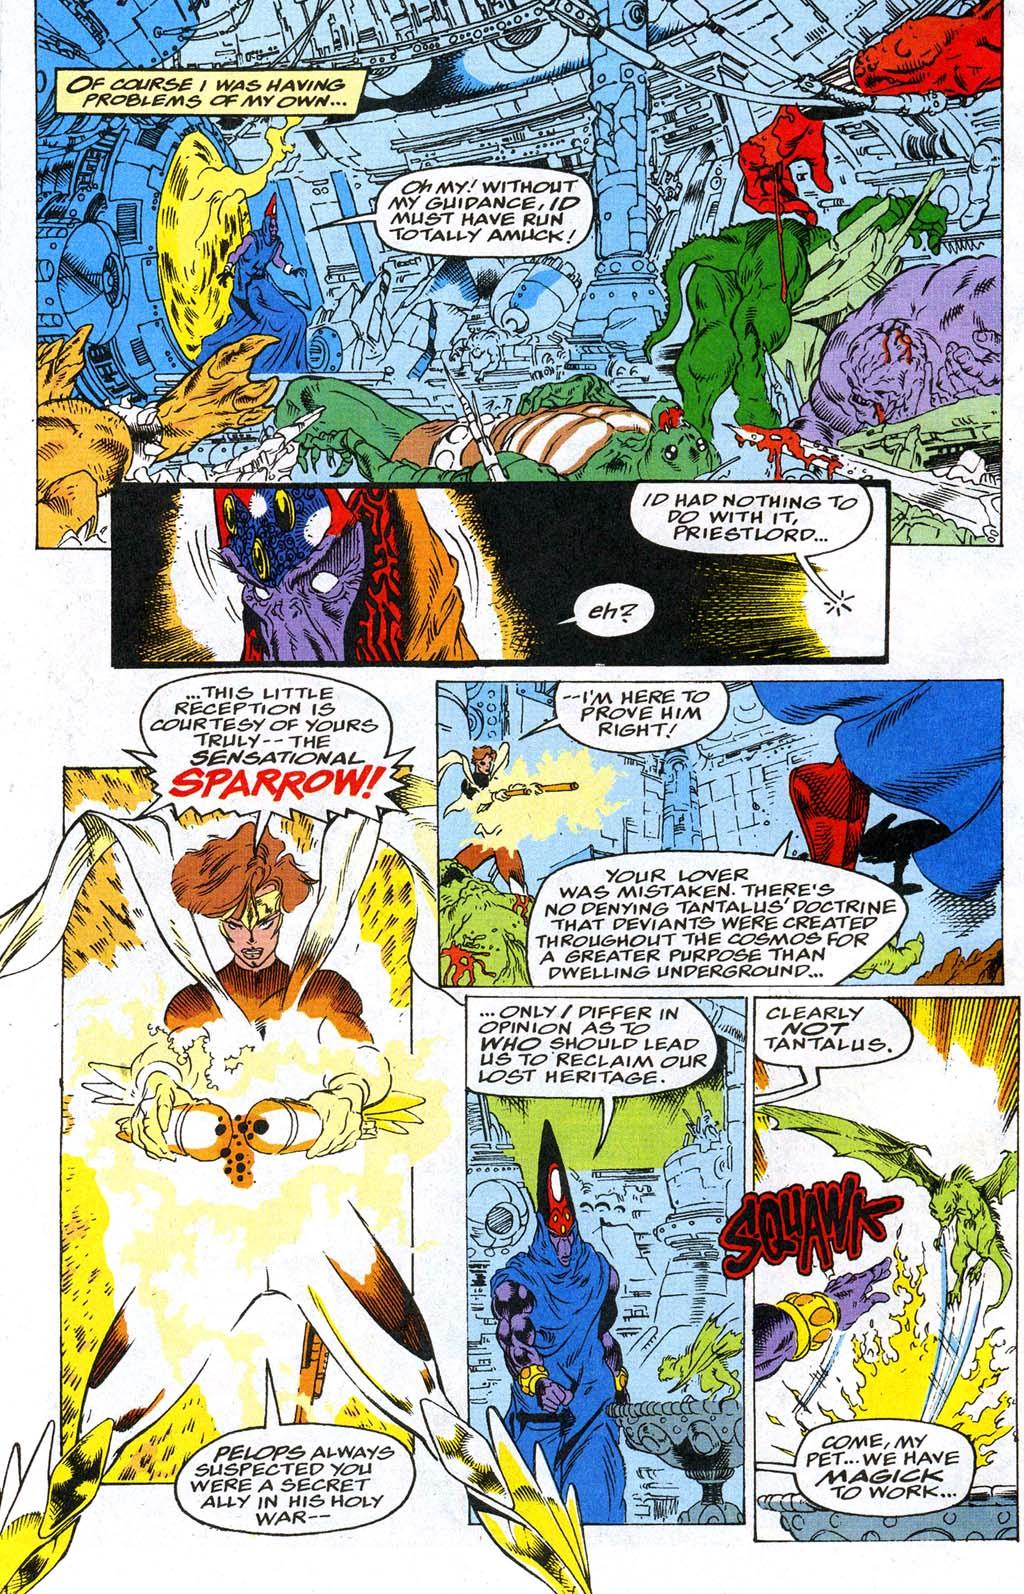 Read online Blackwulf comic -  Issue #9 - 11